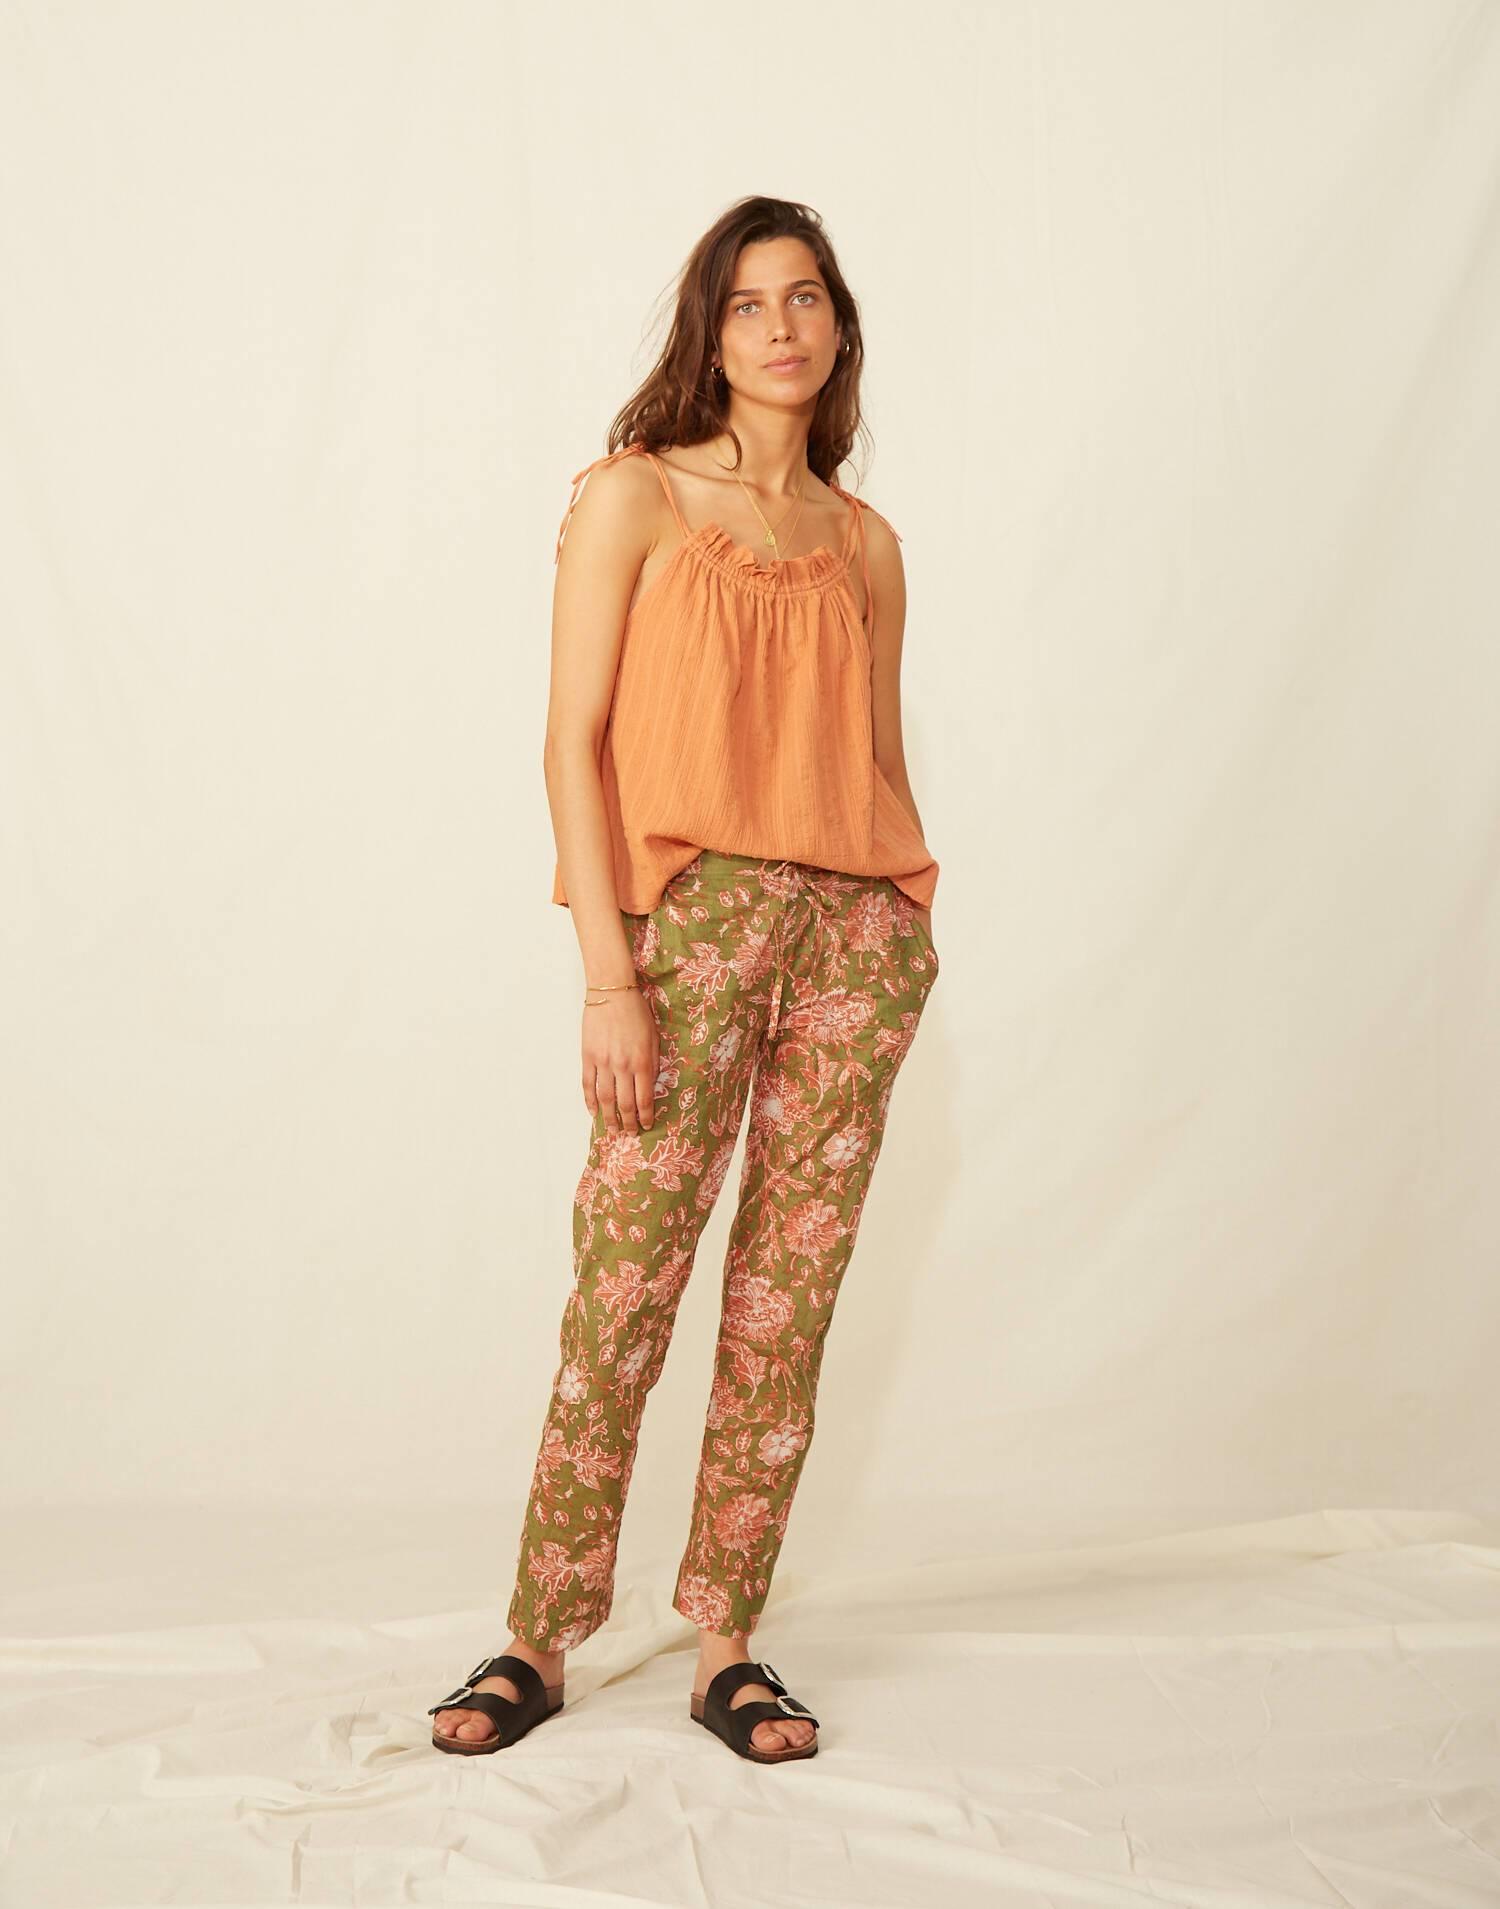 Pantalón goma floral